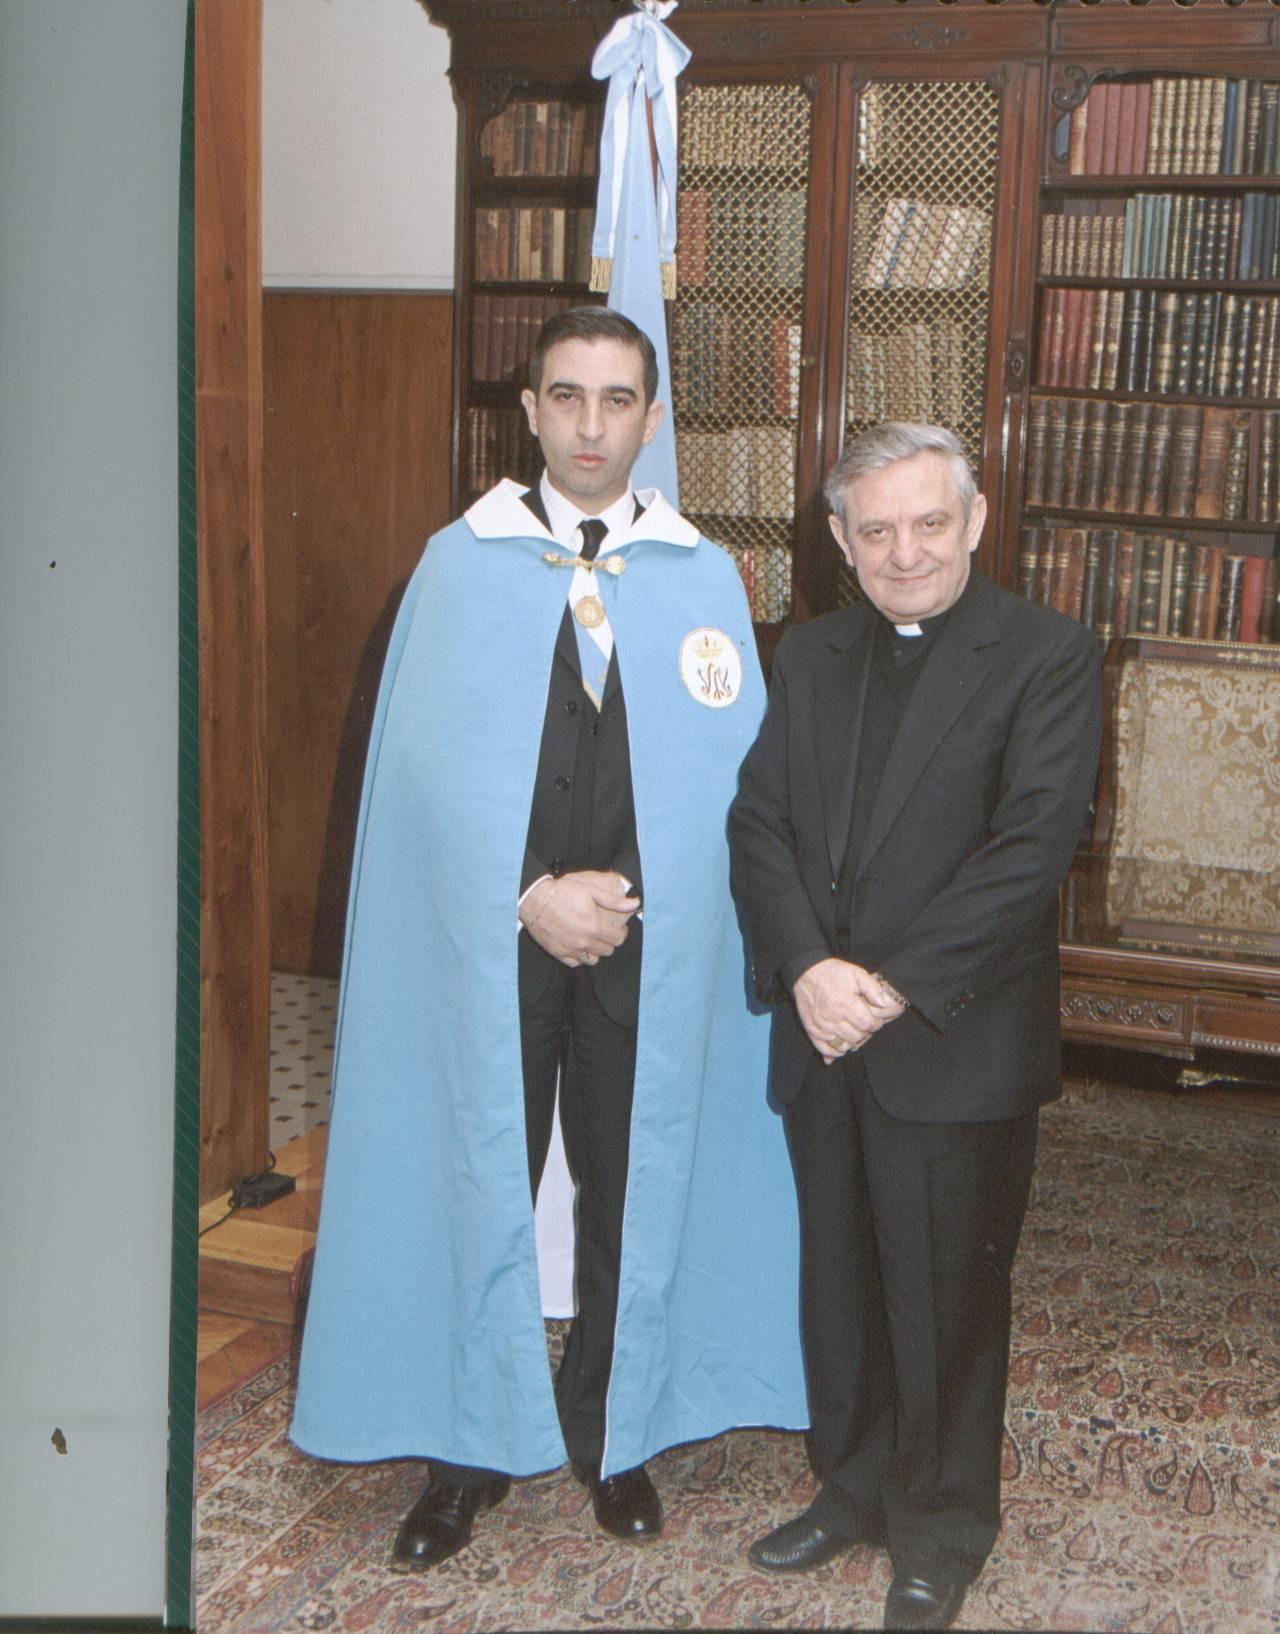 Nuncio Don Adriano Bernardini